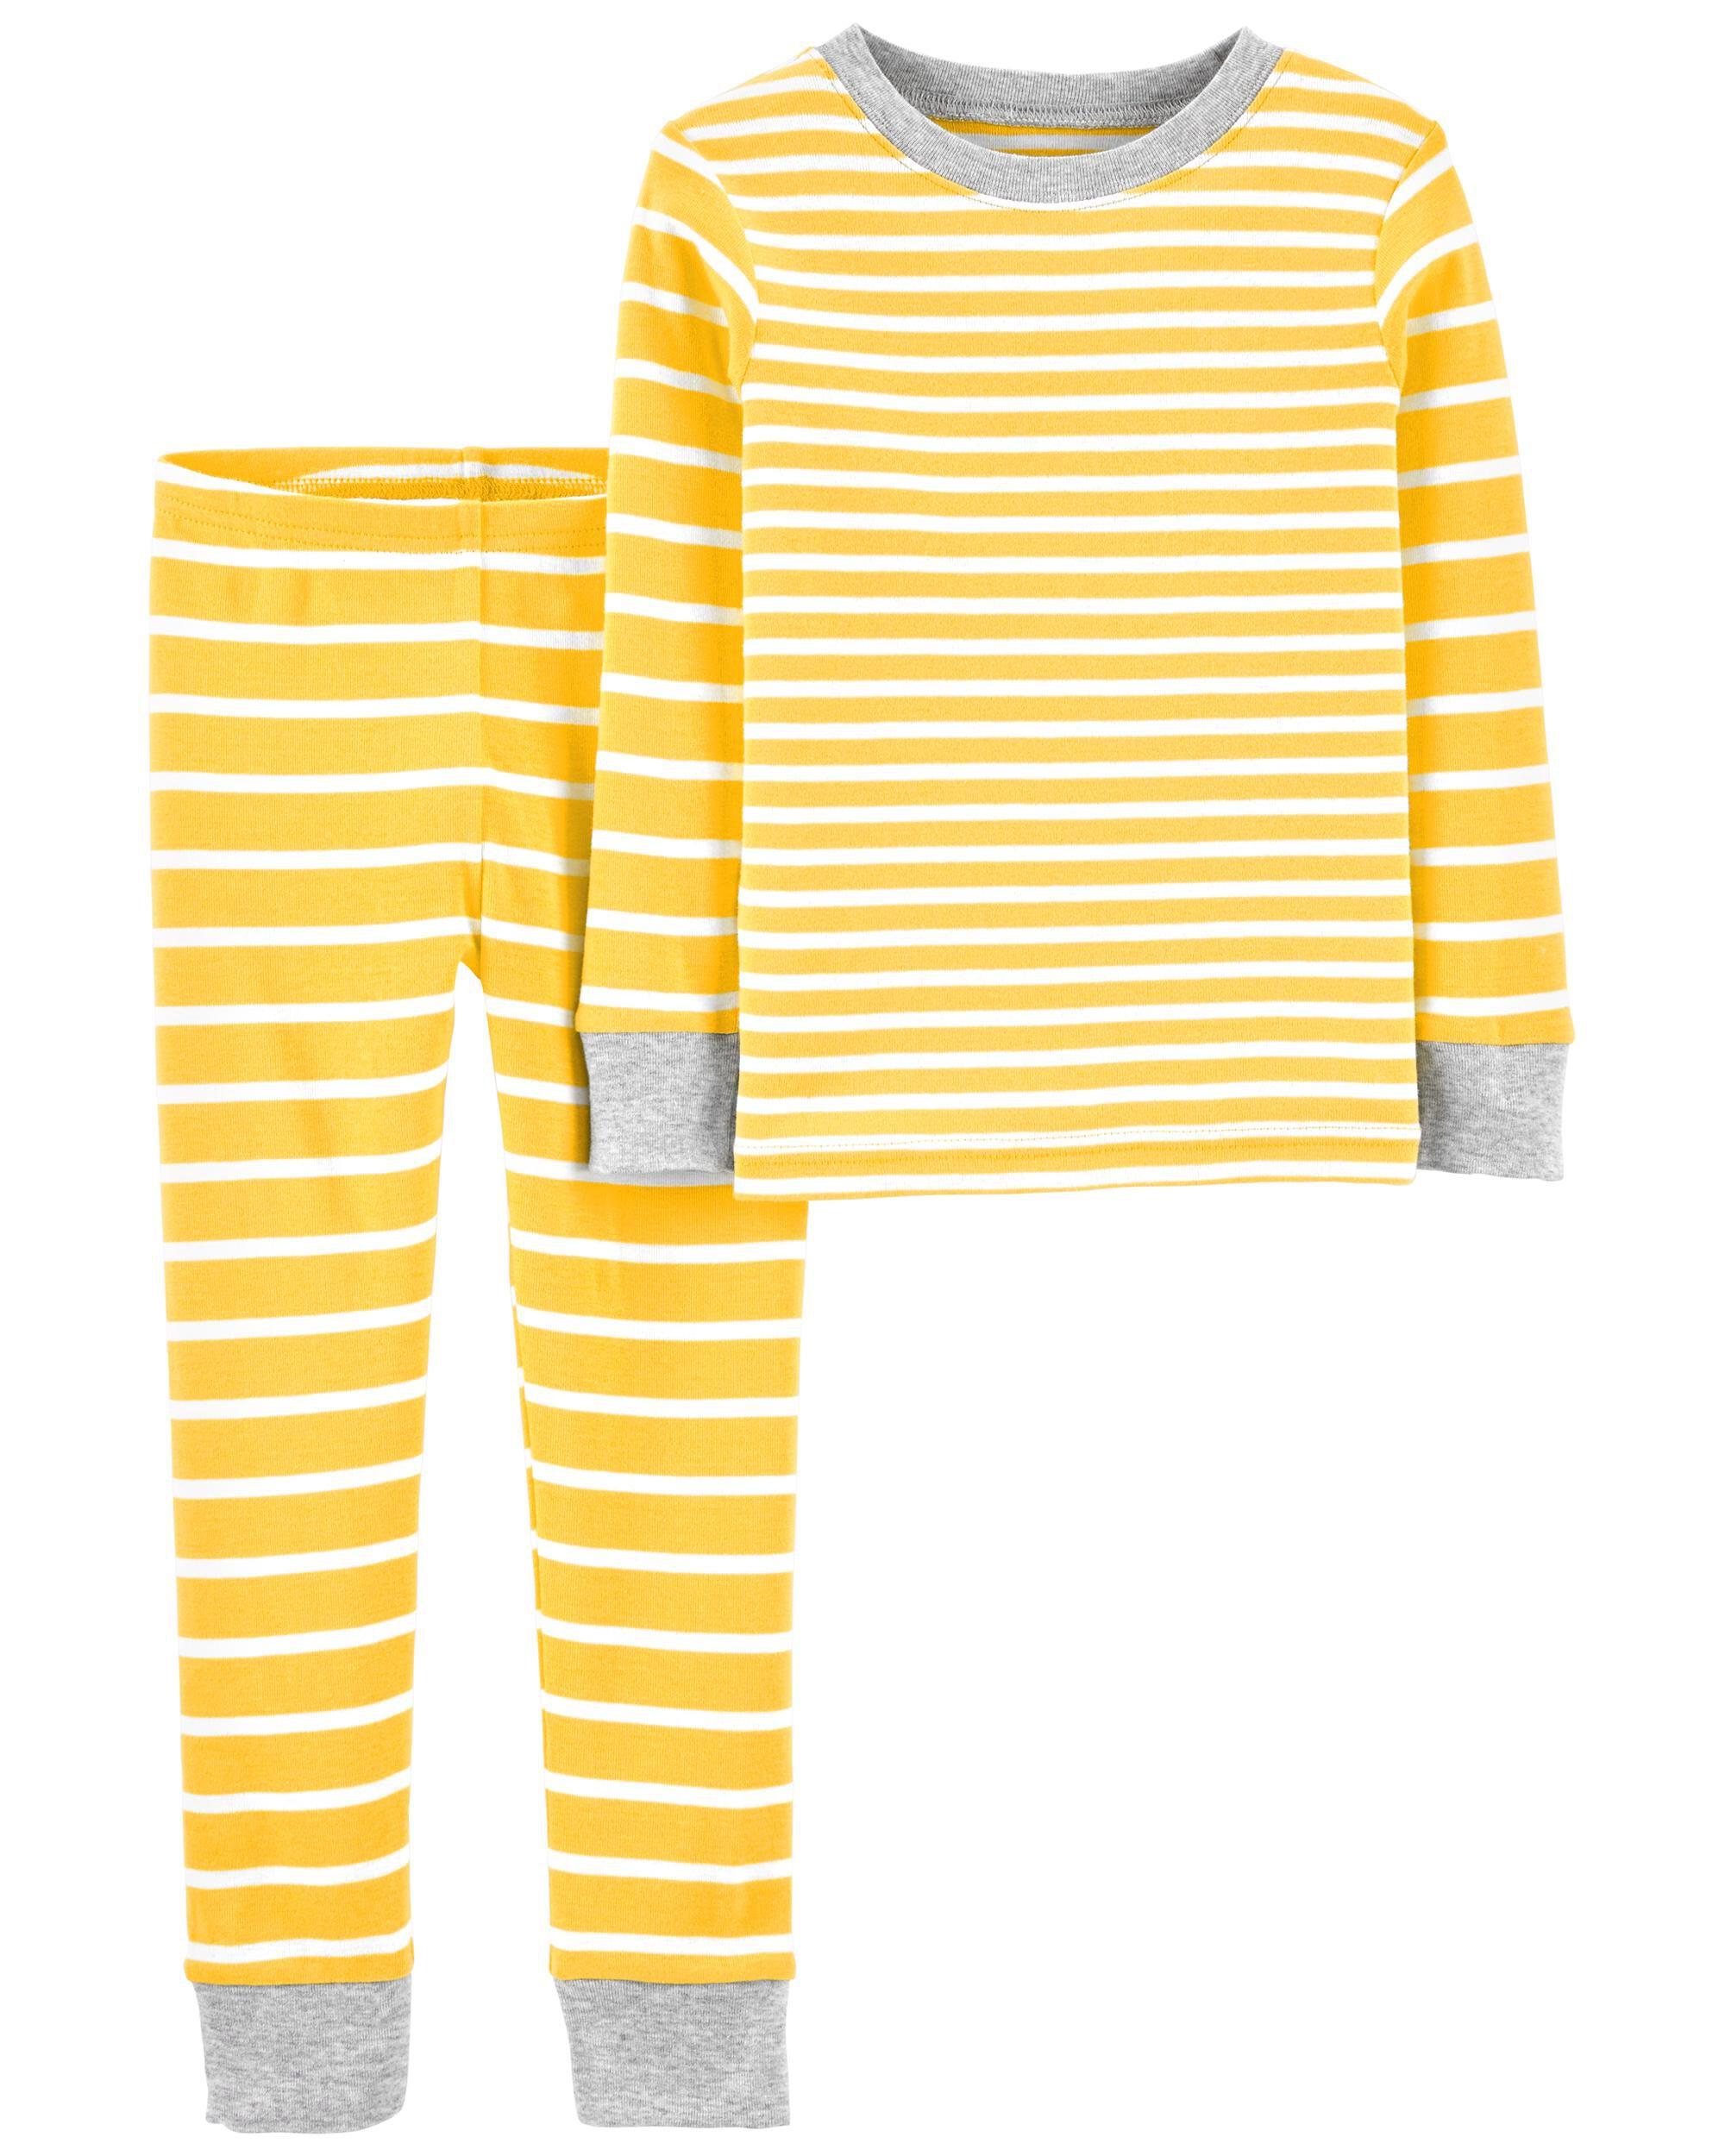 Carters 2-Piece Striped Snug Fit Cotton PJs